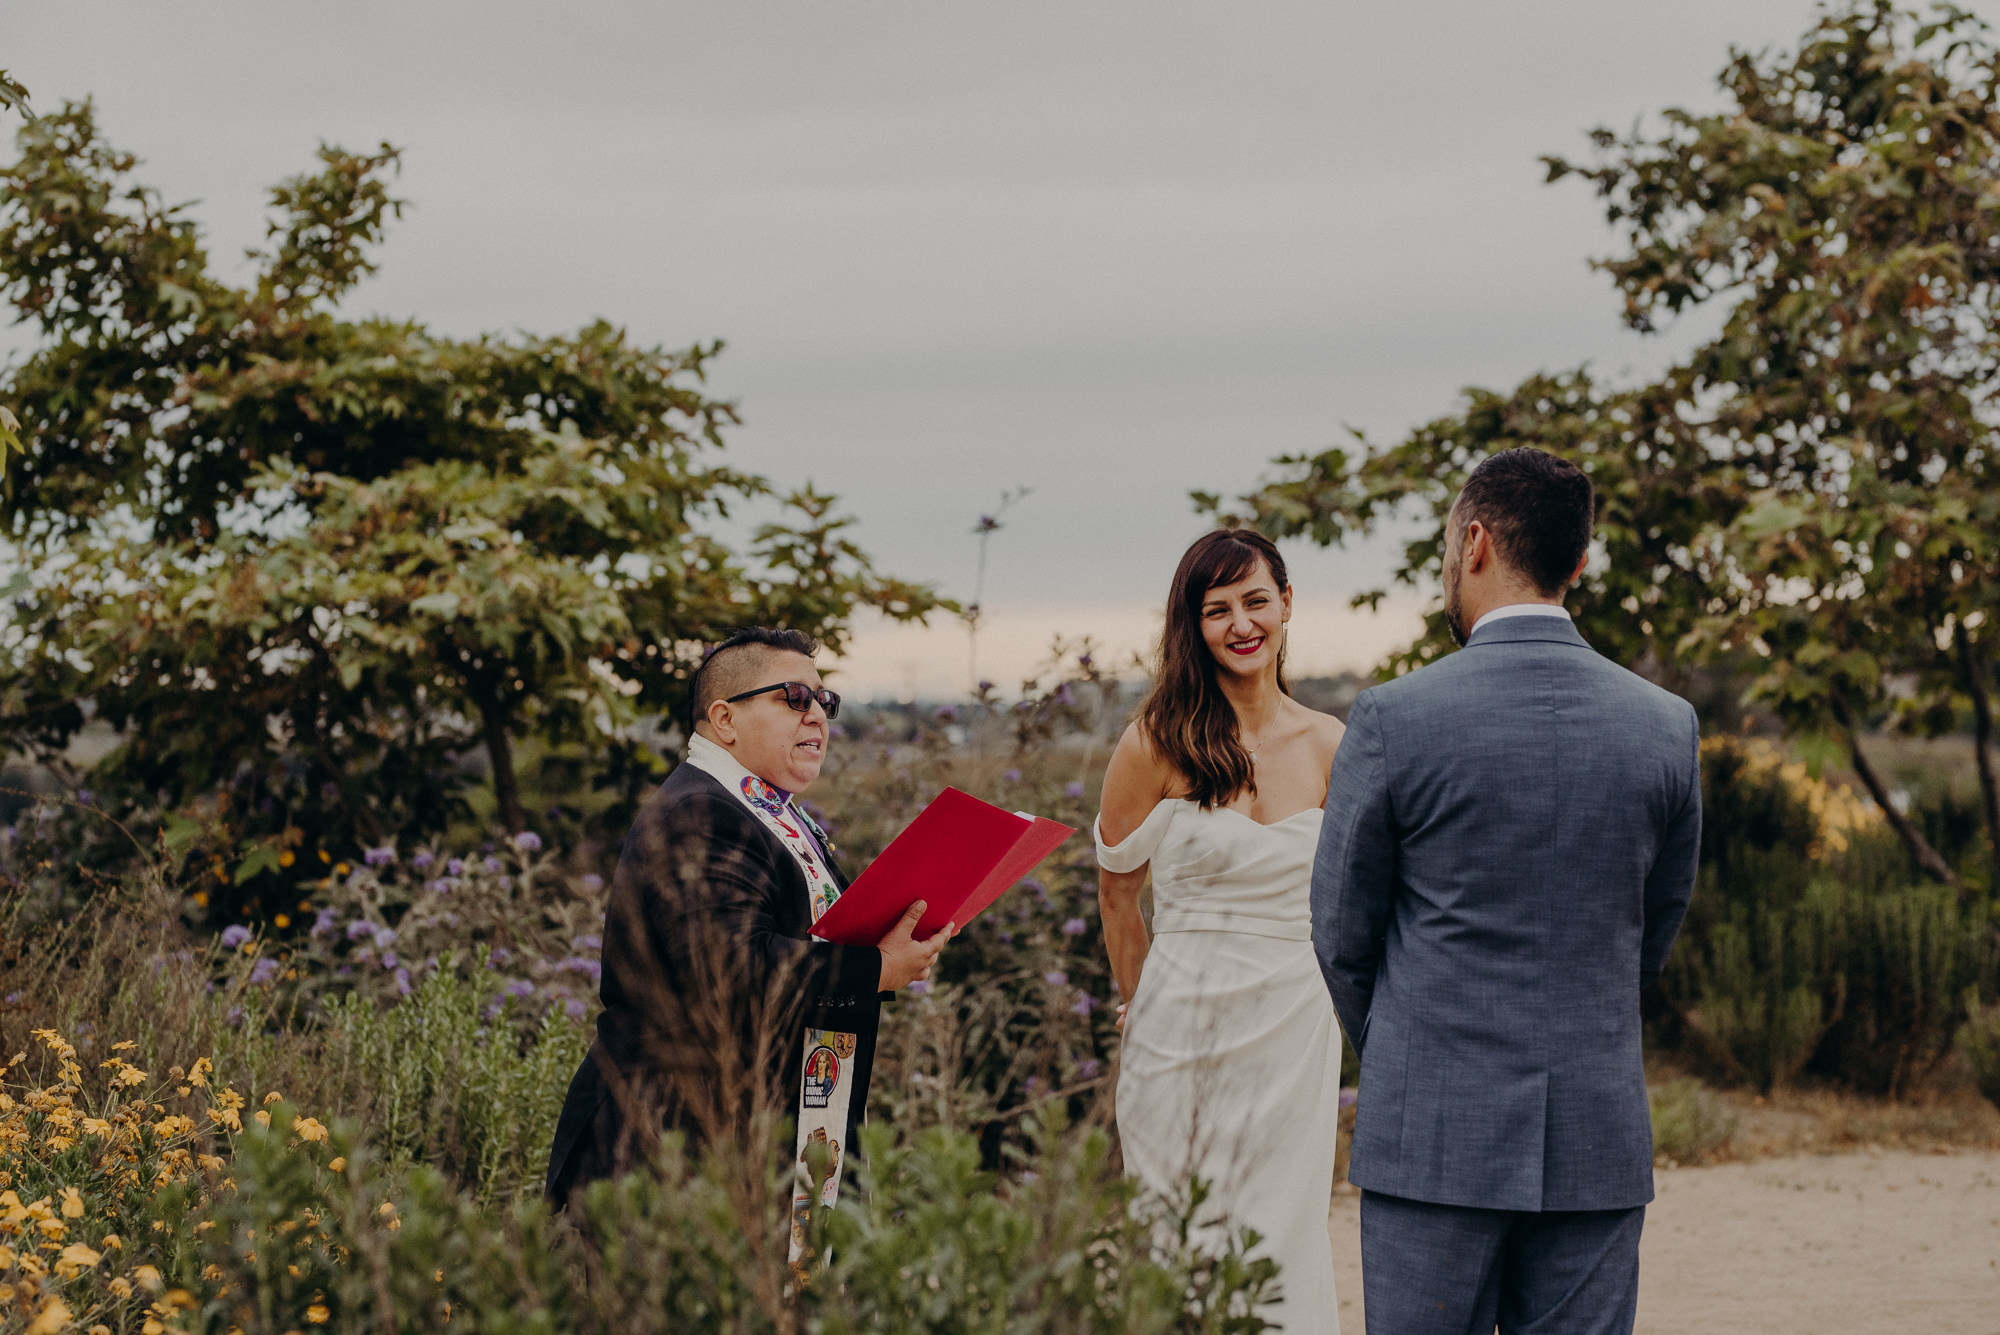 elopement photographer in los angeles - la wedding photographer - isaiahandtaylor.com-061.jpg